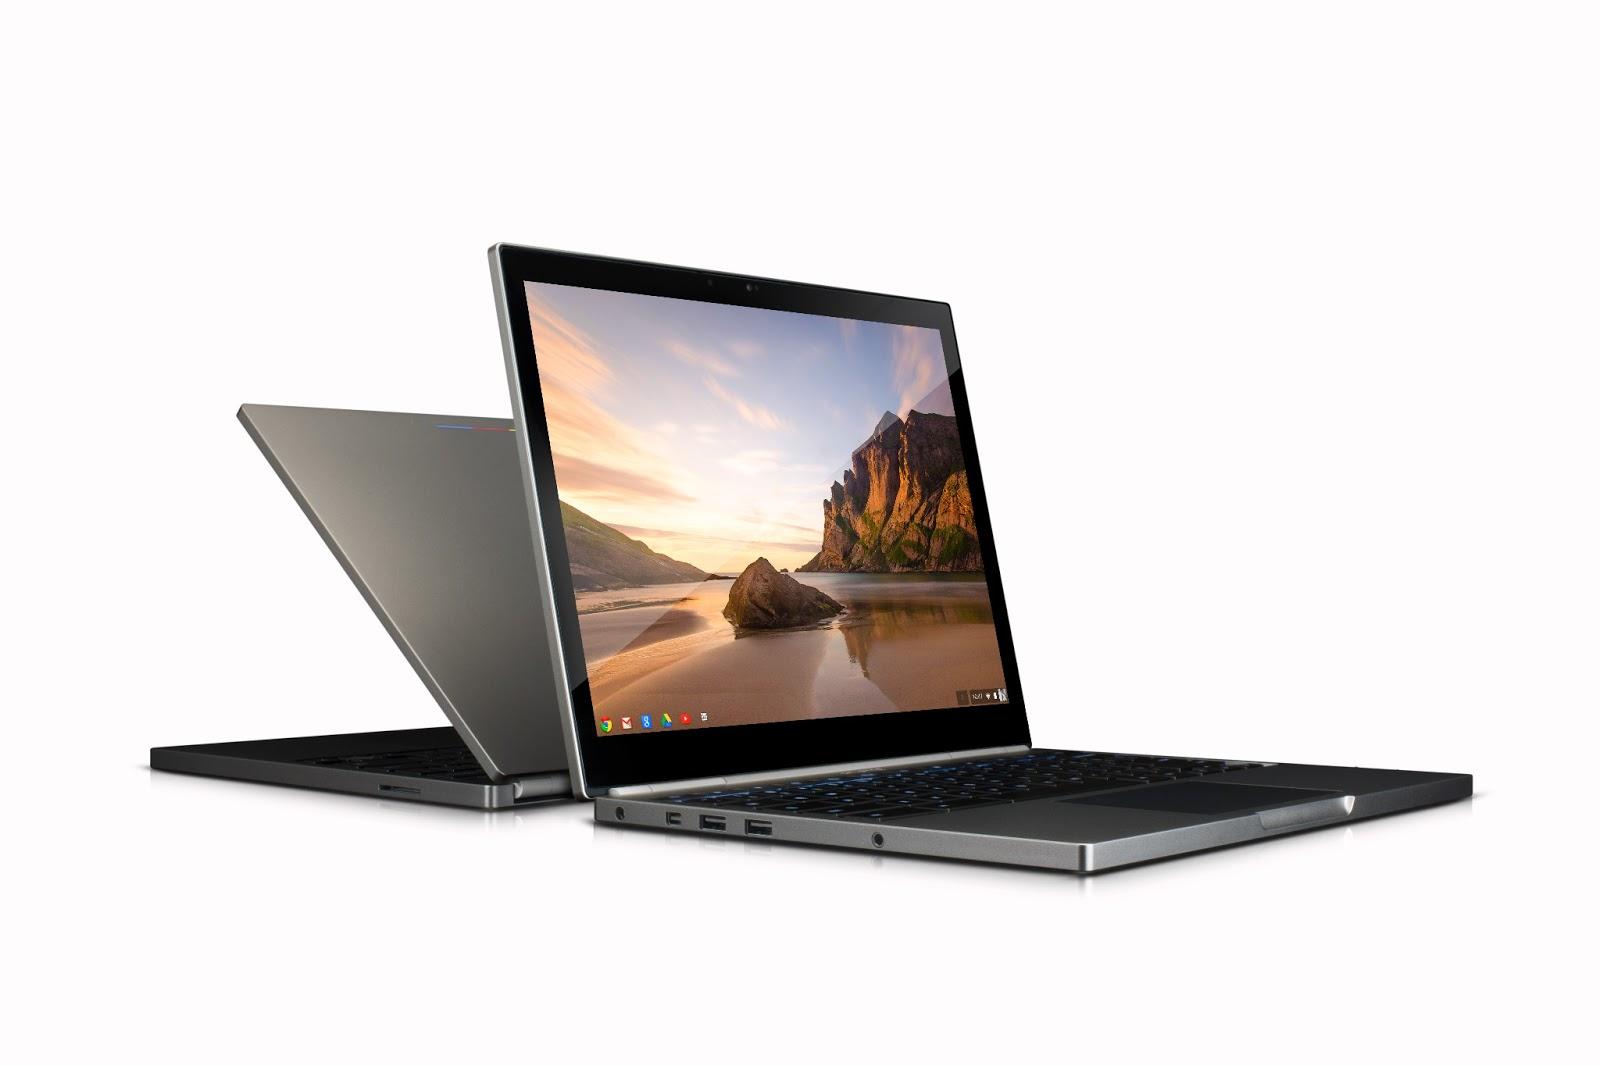 ChromeBook, Google, Chrome OS, Lenovo, HP, Windows 8, Laptop-news